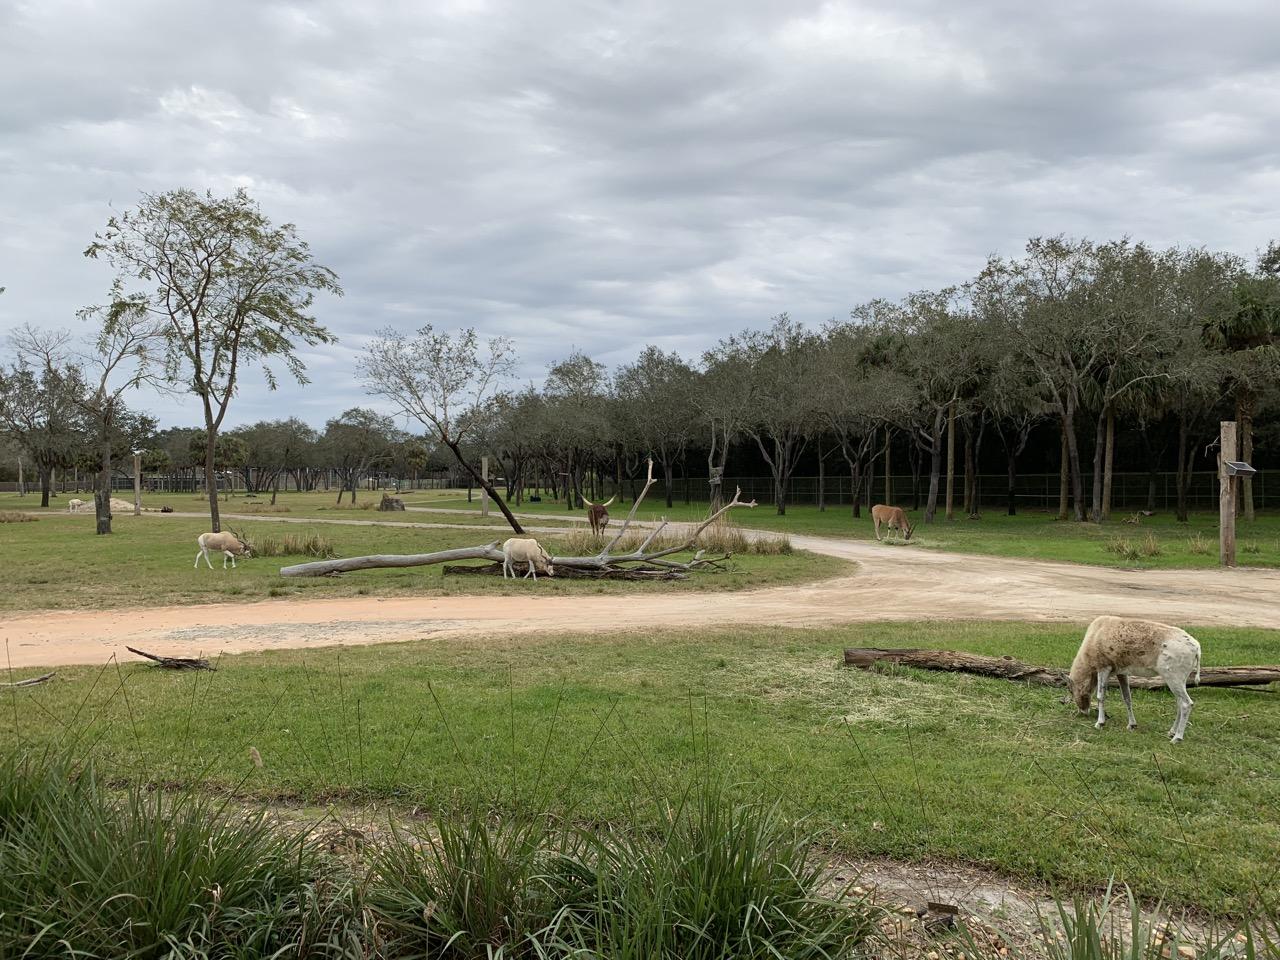 disney world best deluxe resort hotel ranking 04 animal kingdom lodge savanna.jpeg